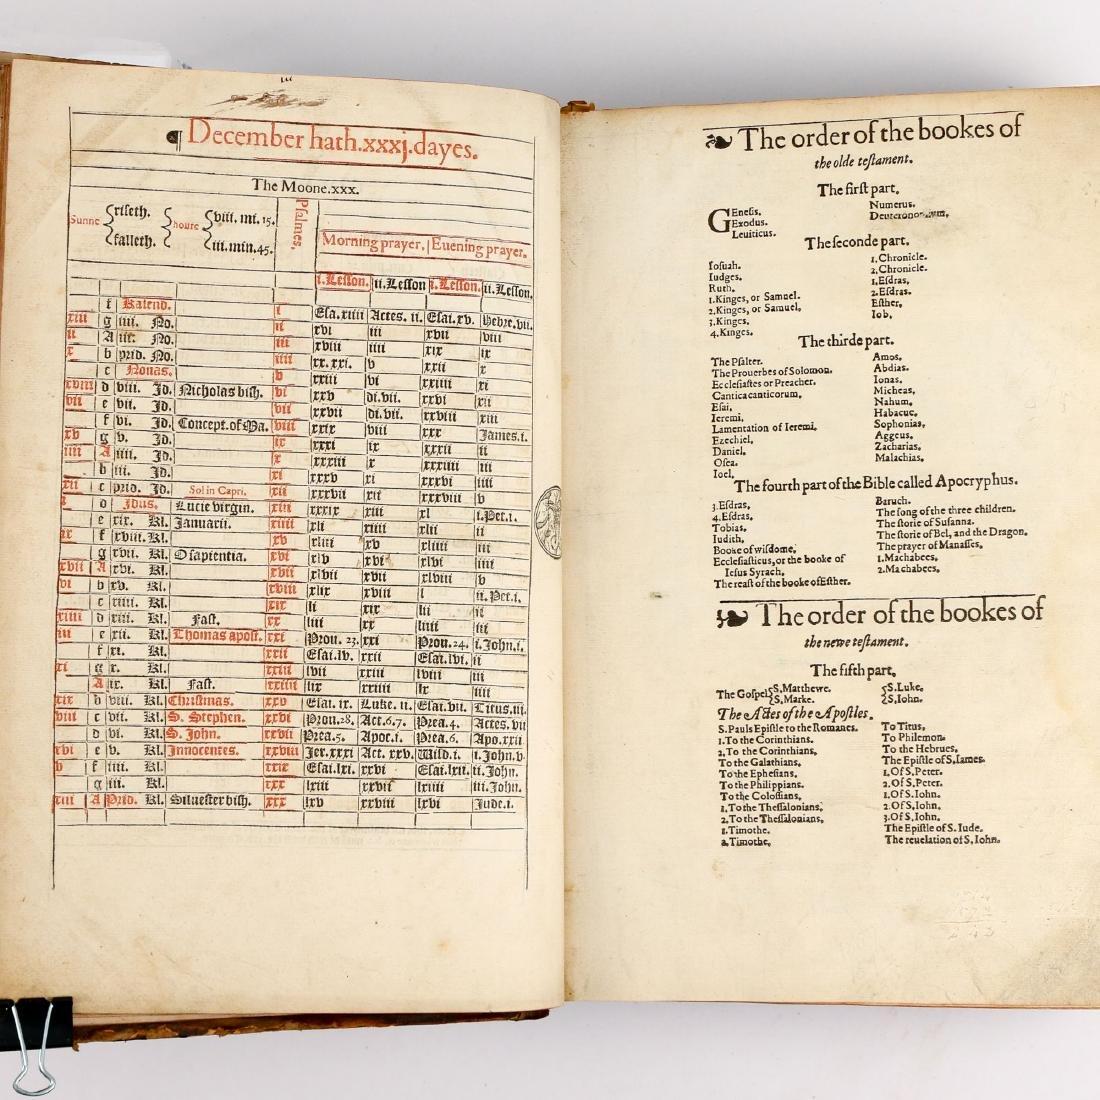 [FRANCIS FRY COPY] BISHOPS' BIBLE [1572] - 10